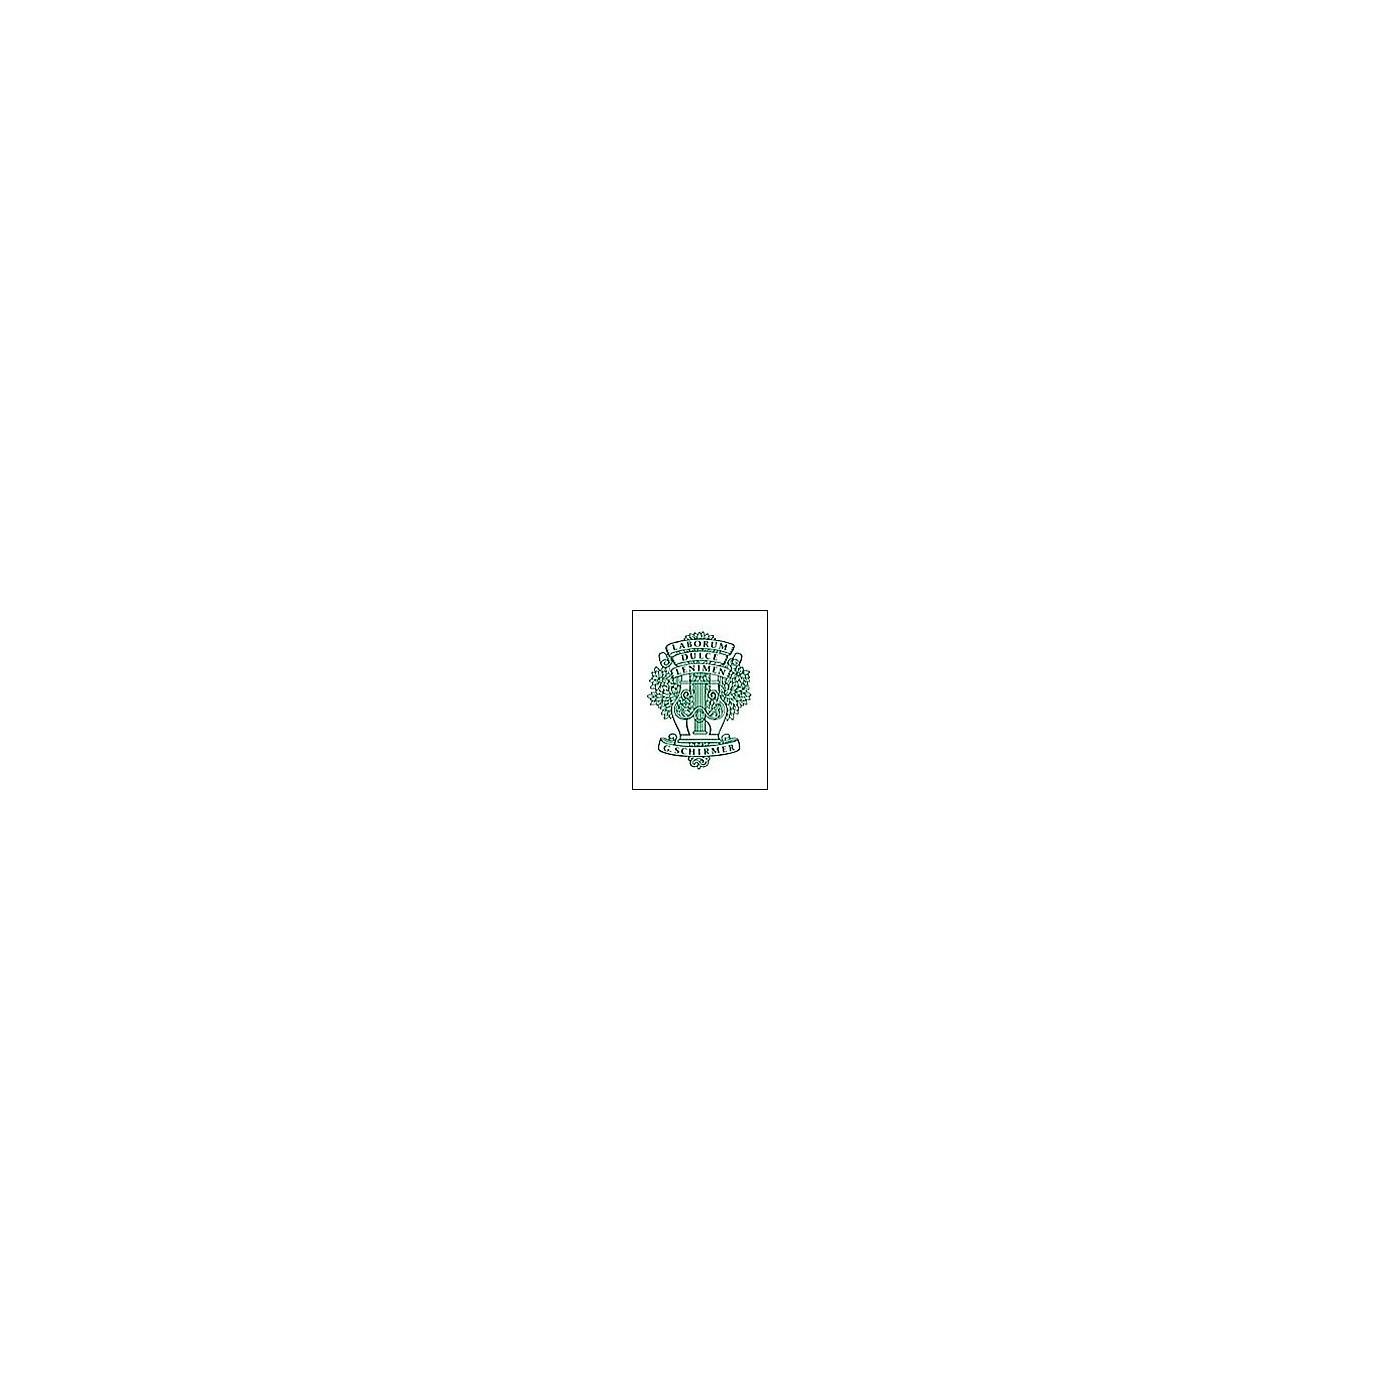 G. Schirmer 100 Sonatas Vol 2 Pno No 34-67 By Scarlotti thumbnail